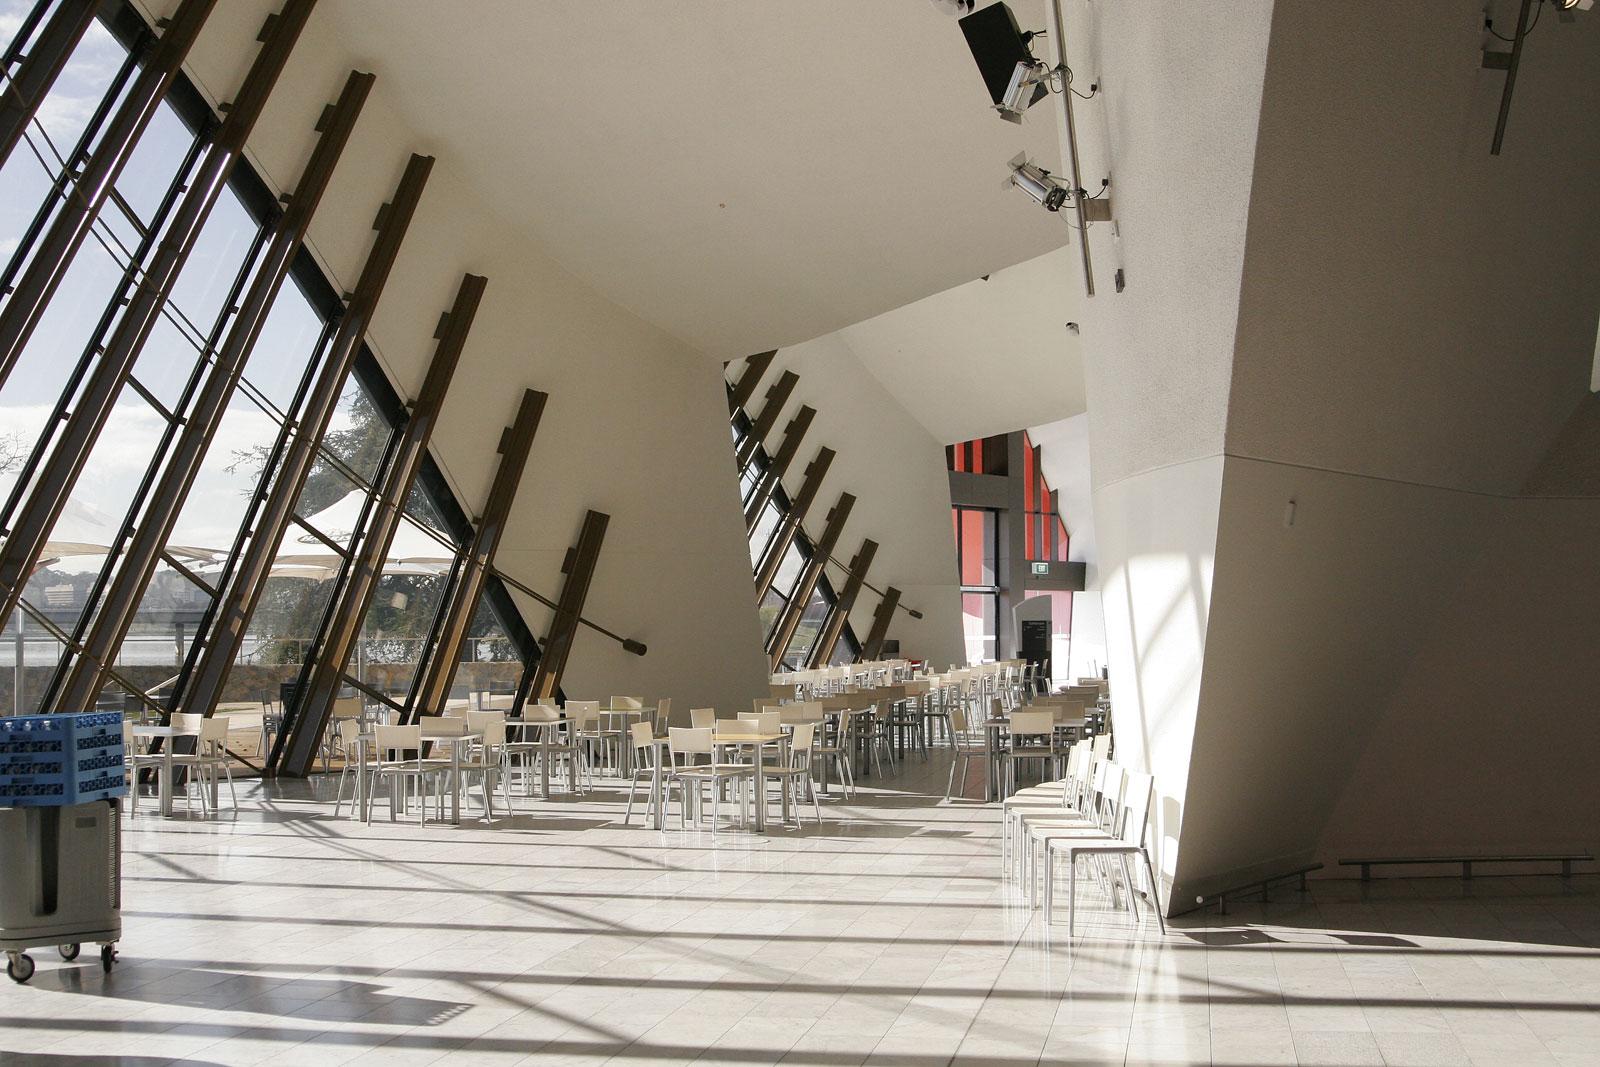 File:Interior of national museum.jpg - Wikimedia Commons